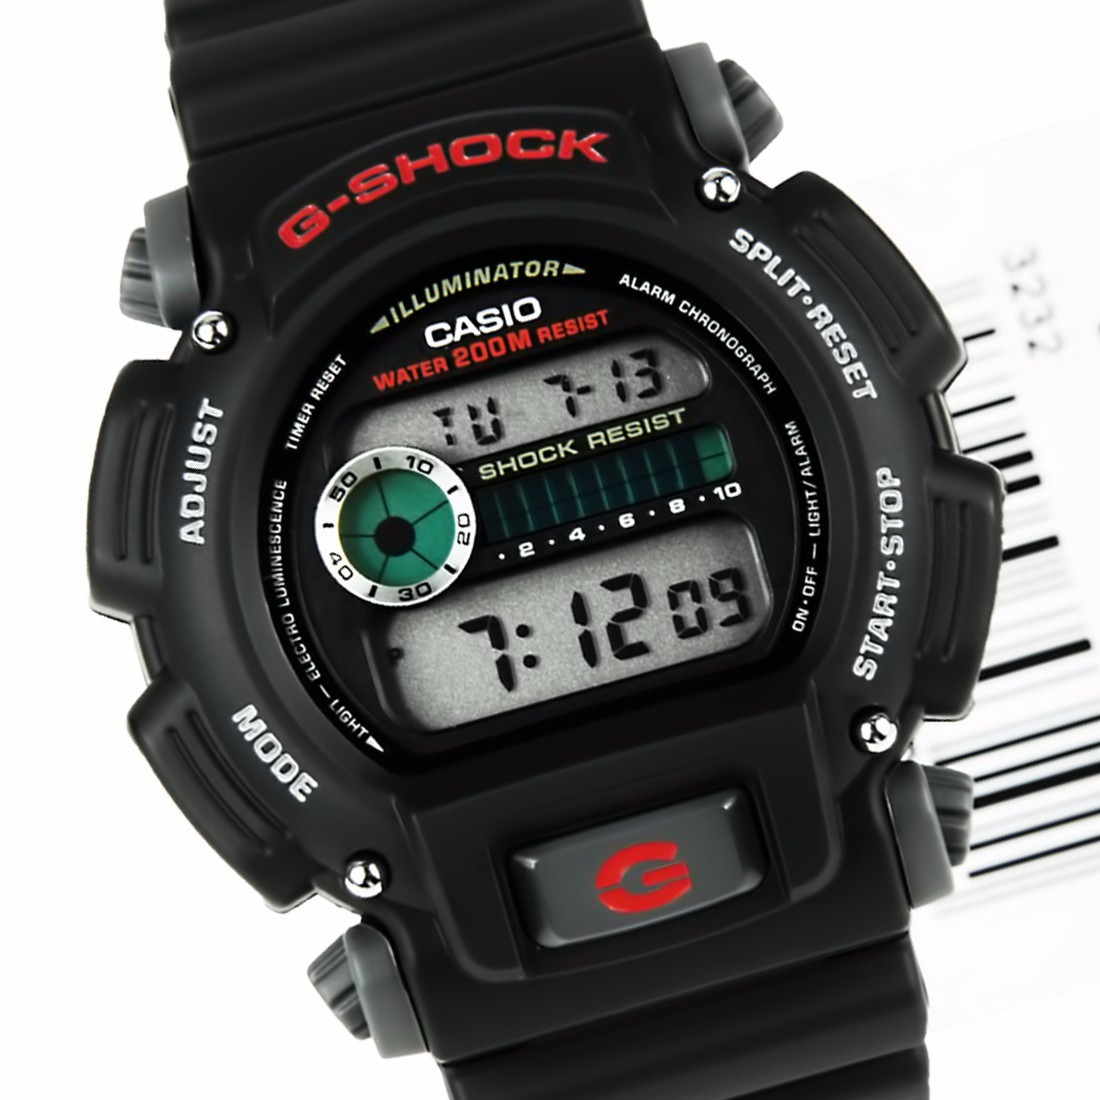 ec148d0d8a6 relogio casio g-shock dw-9052 alarme cronometro wr 200 mts p. Carregando  zoom.